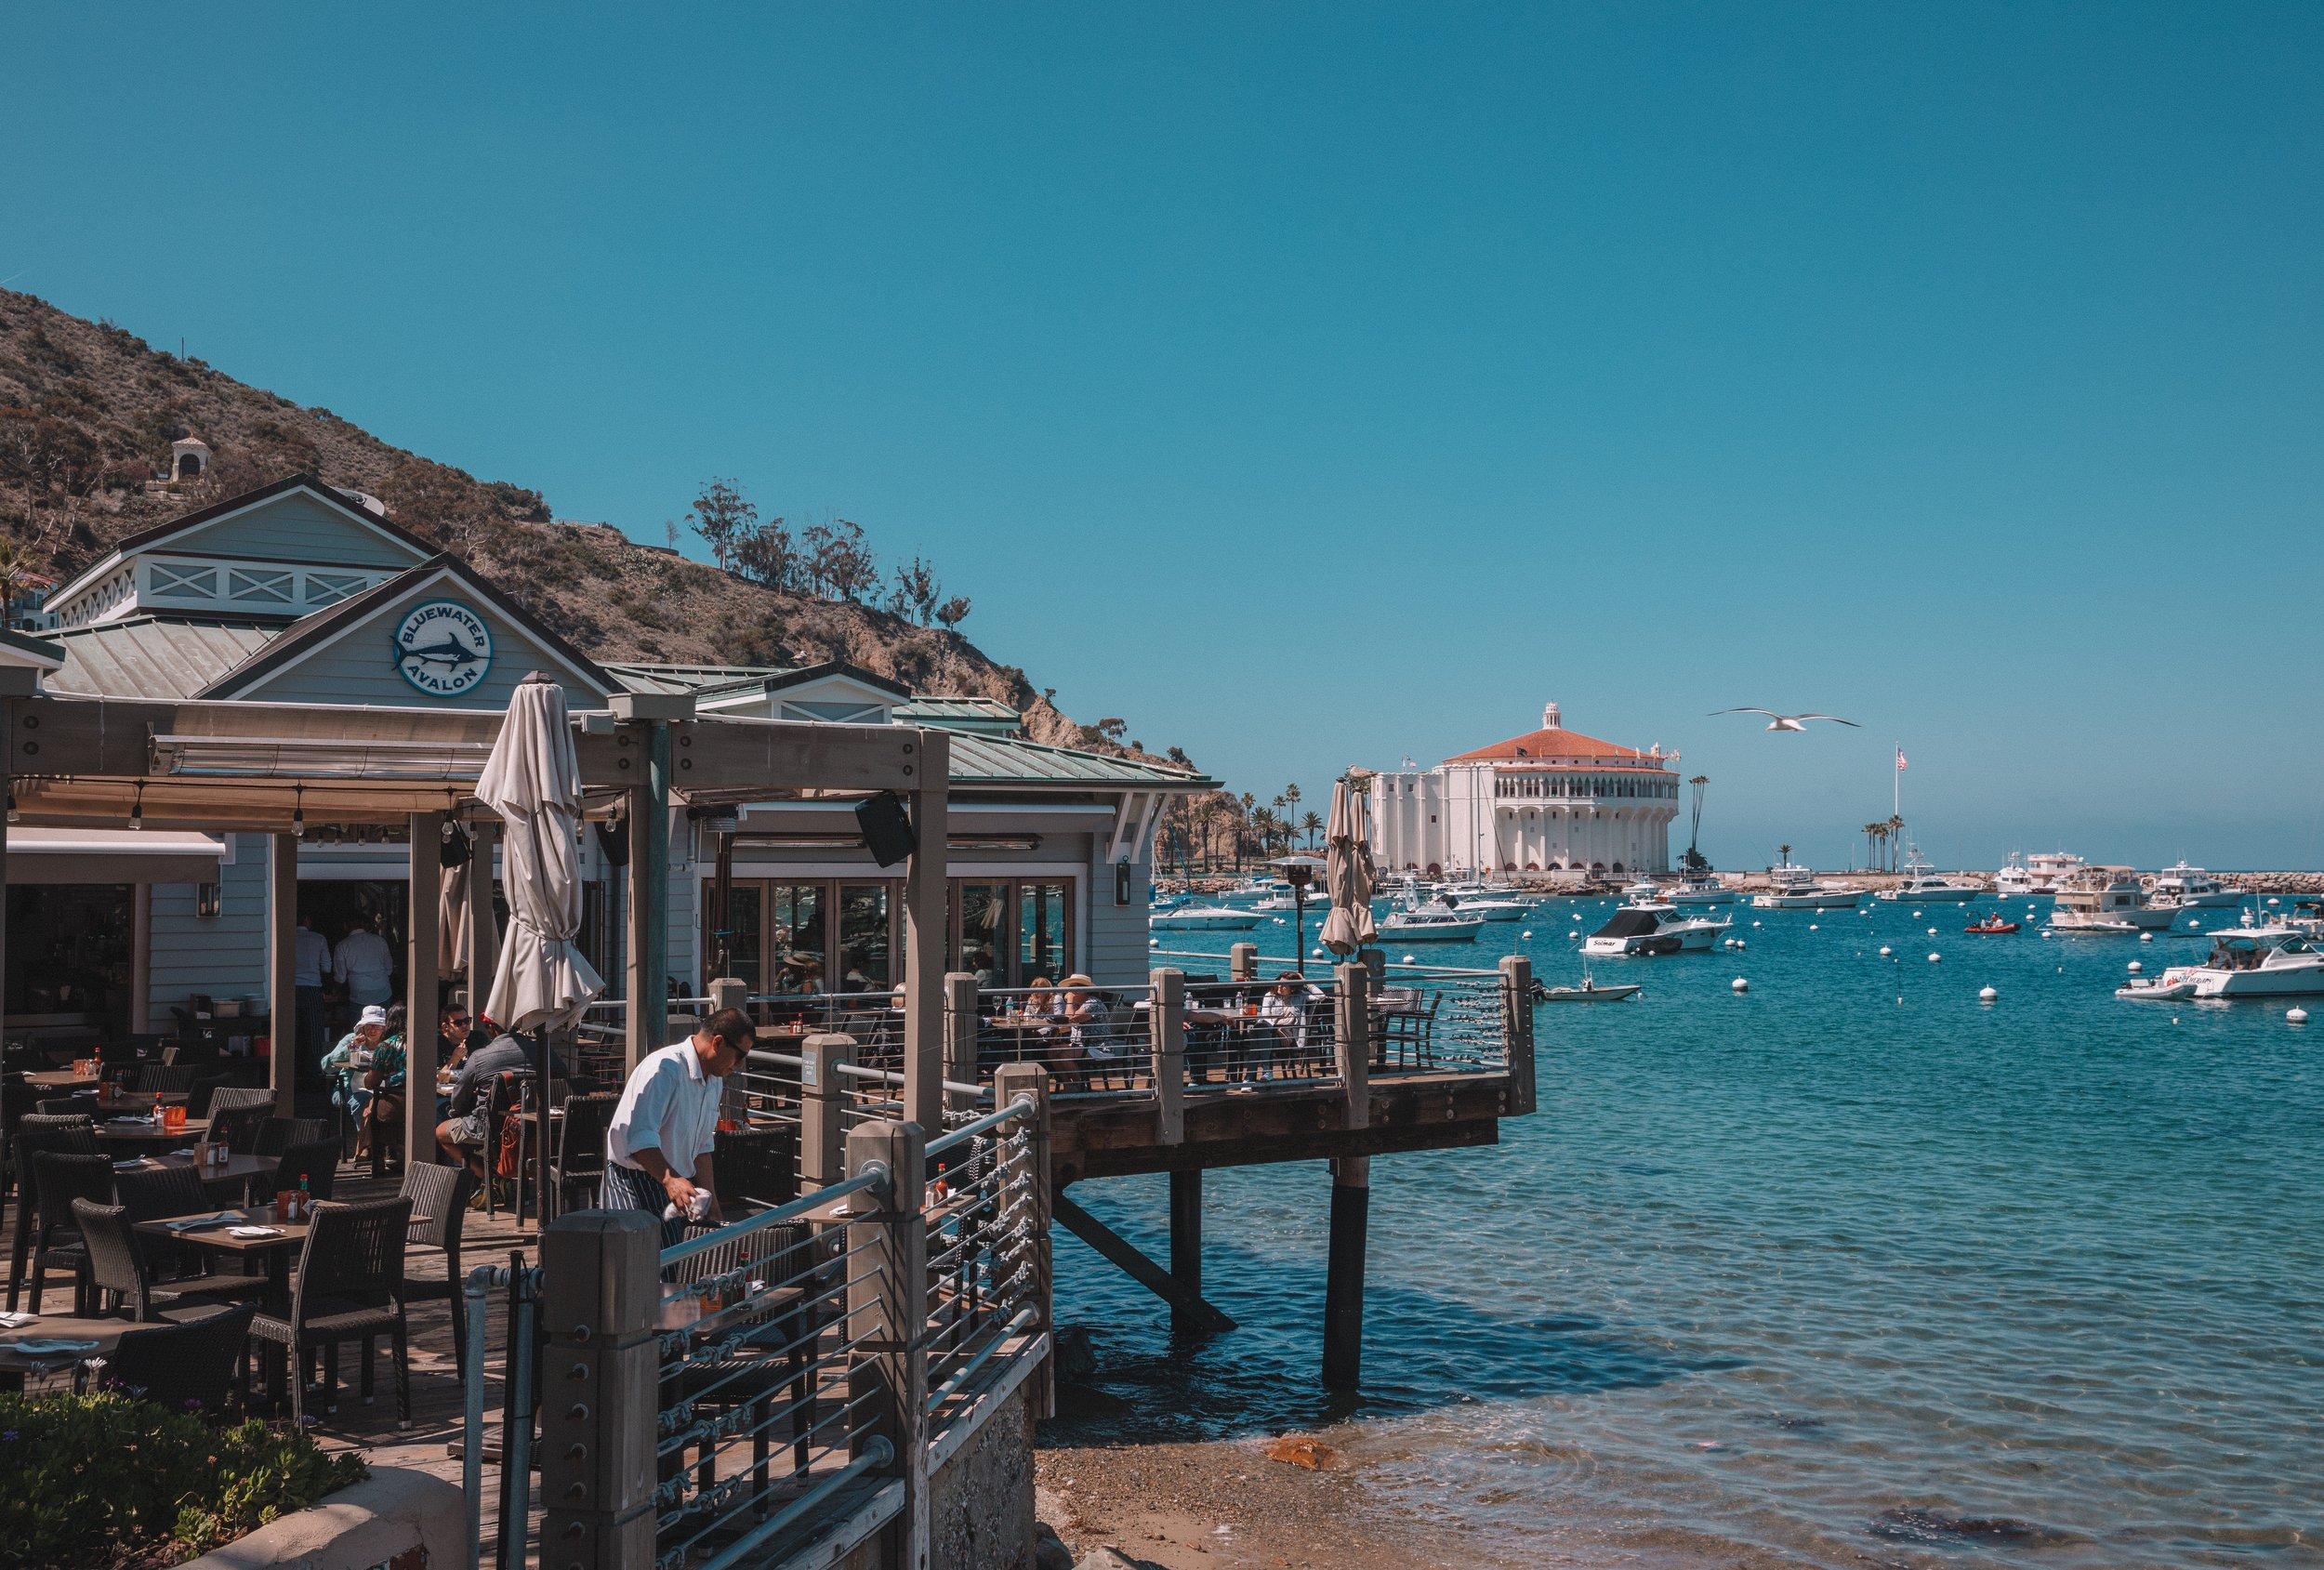 Bluewater Avalon, located on Santa Catalina Island.